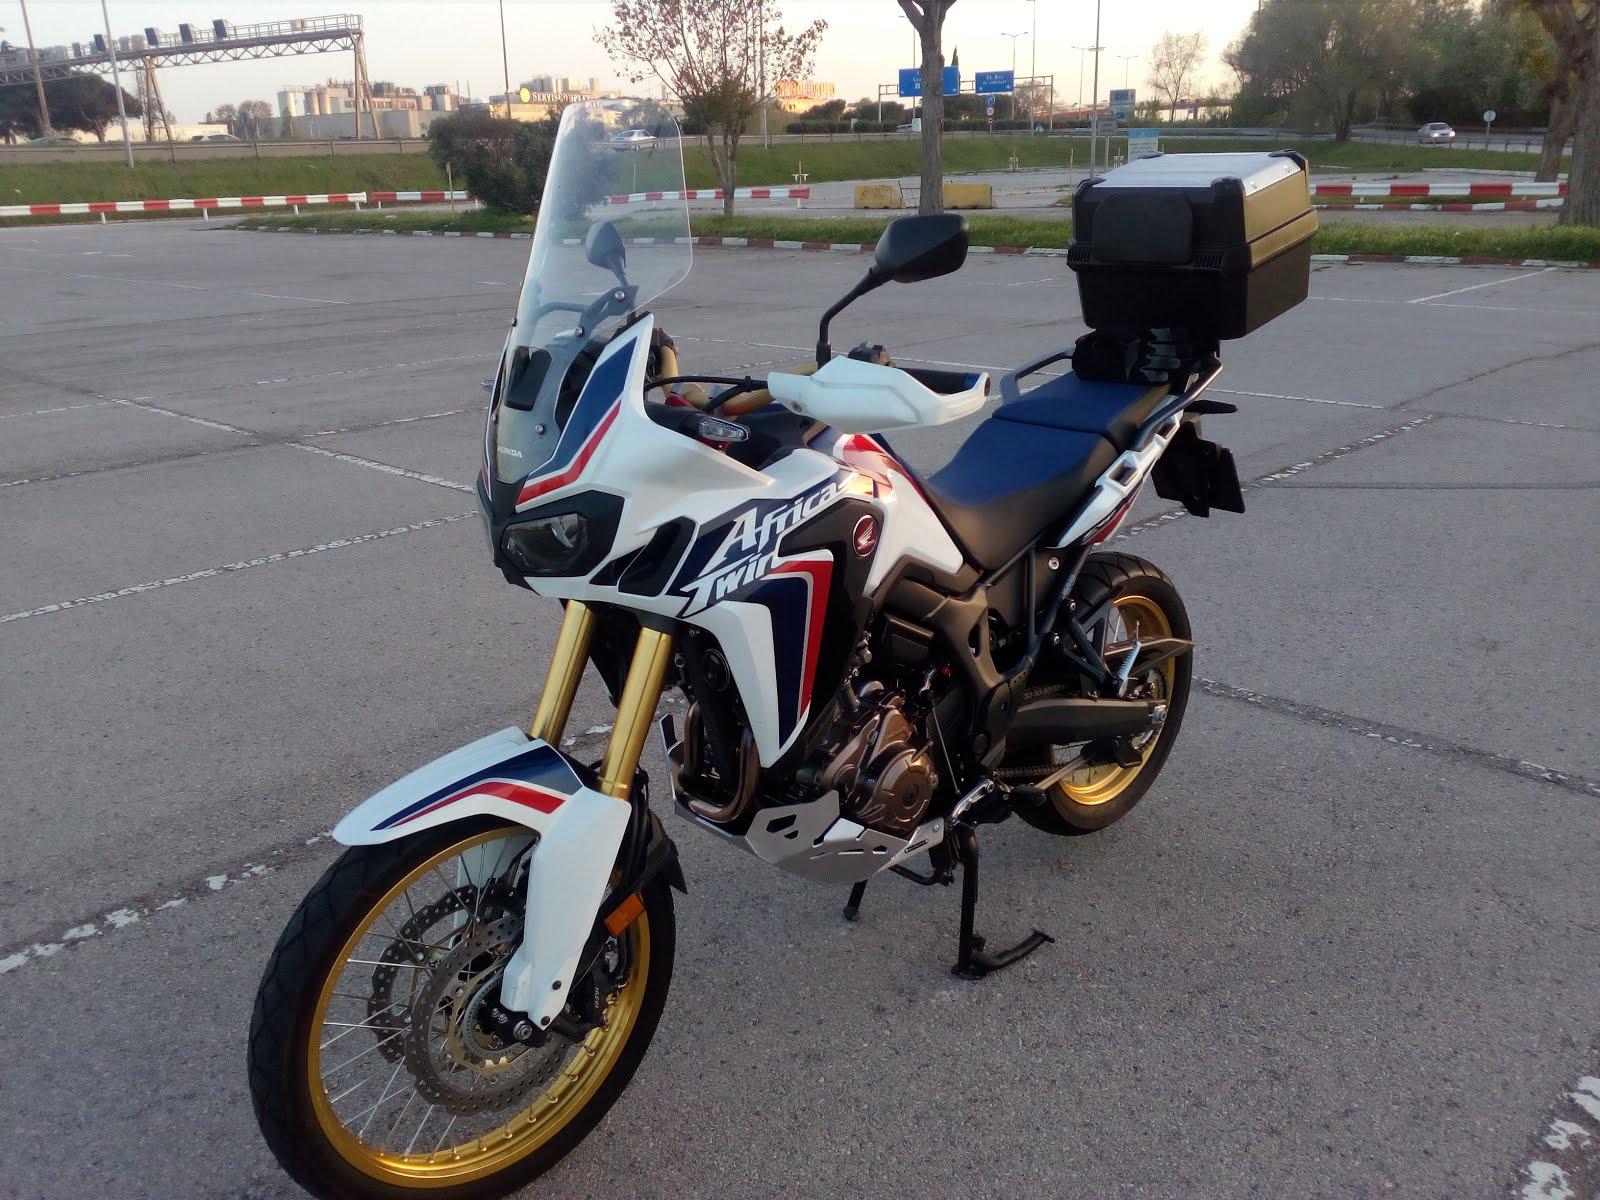 CRF 1000 L